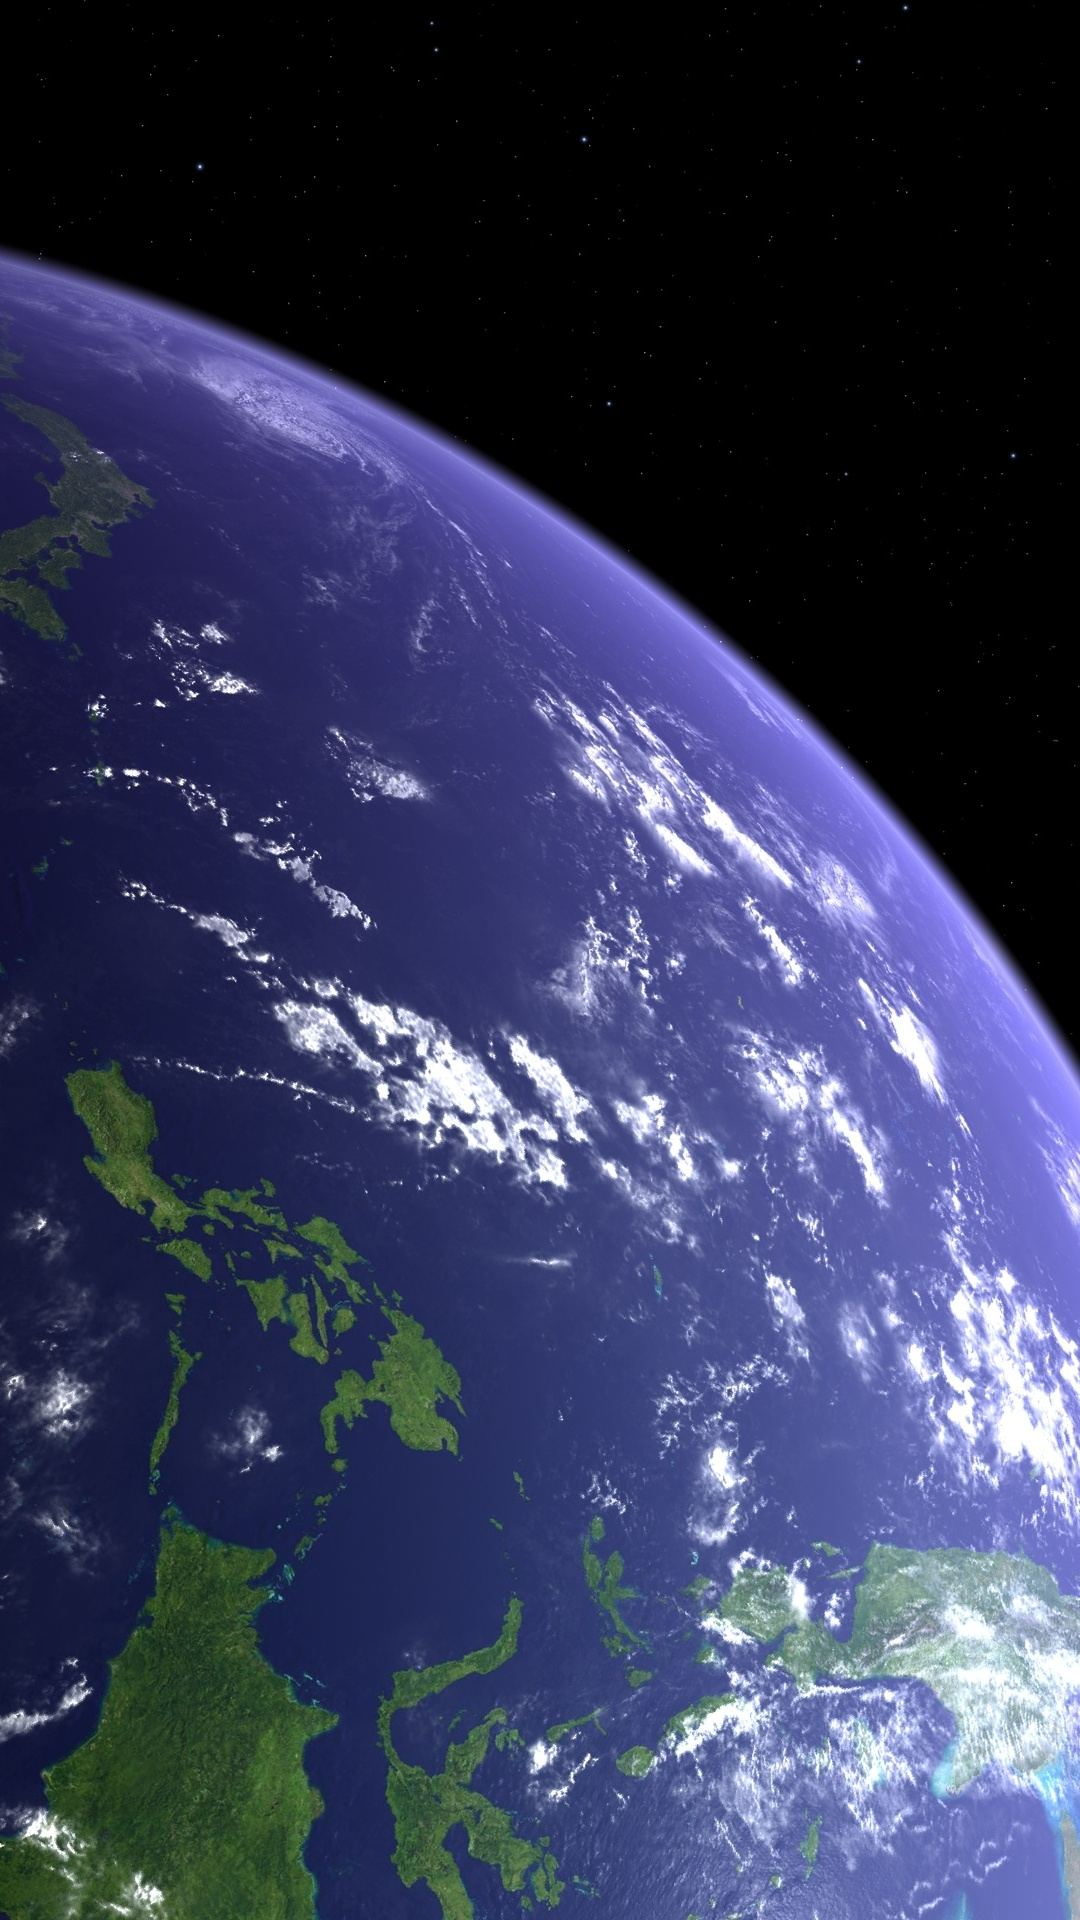 Planet Earth Orbital View iPhone 6 Plus HD Wallpaper